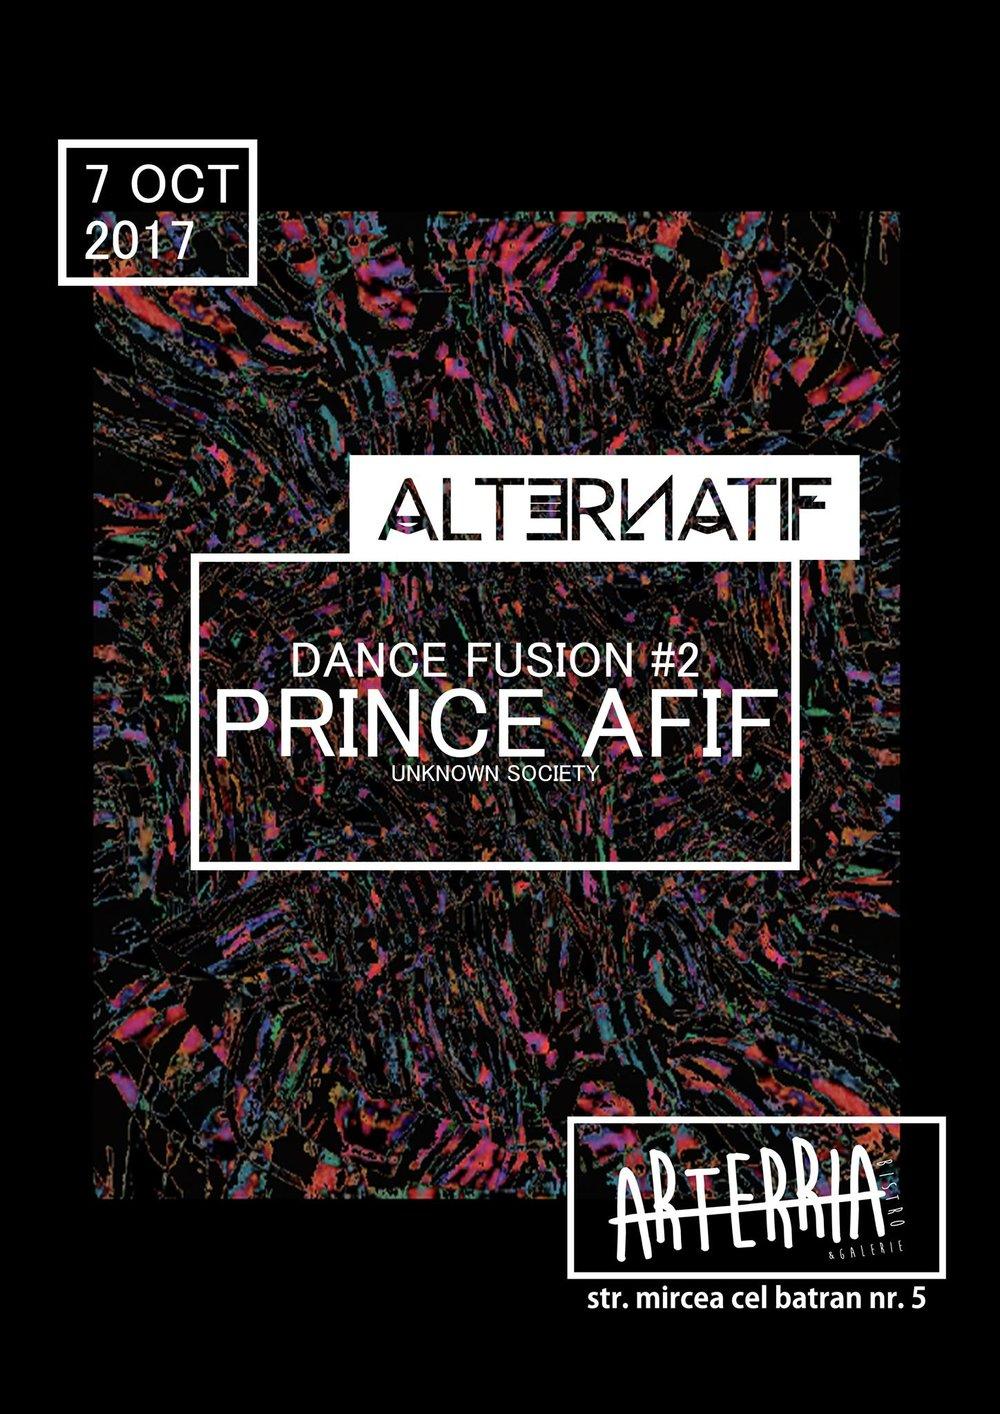 princeafif-dancefusion-2